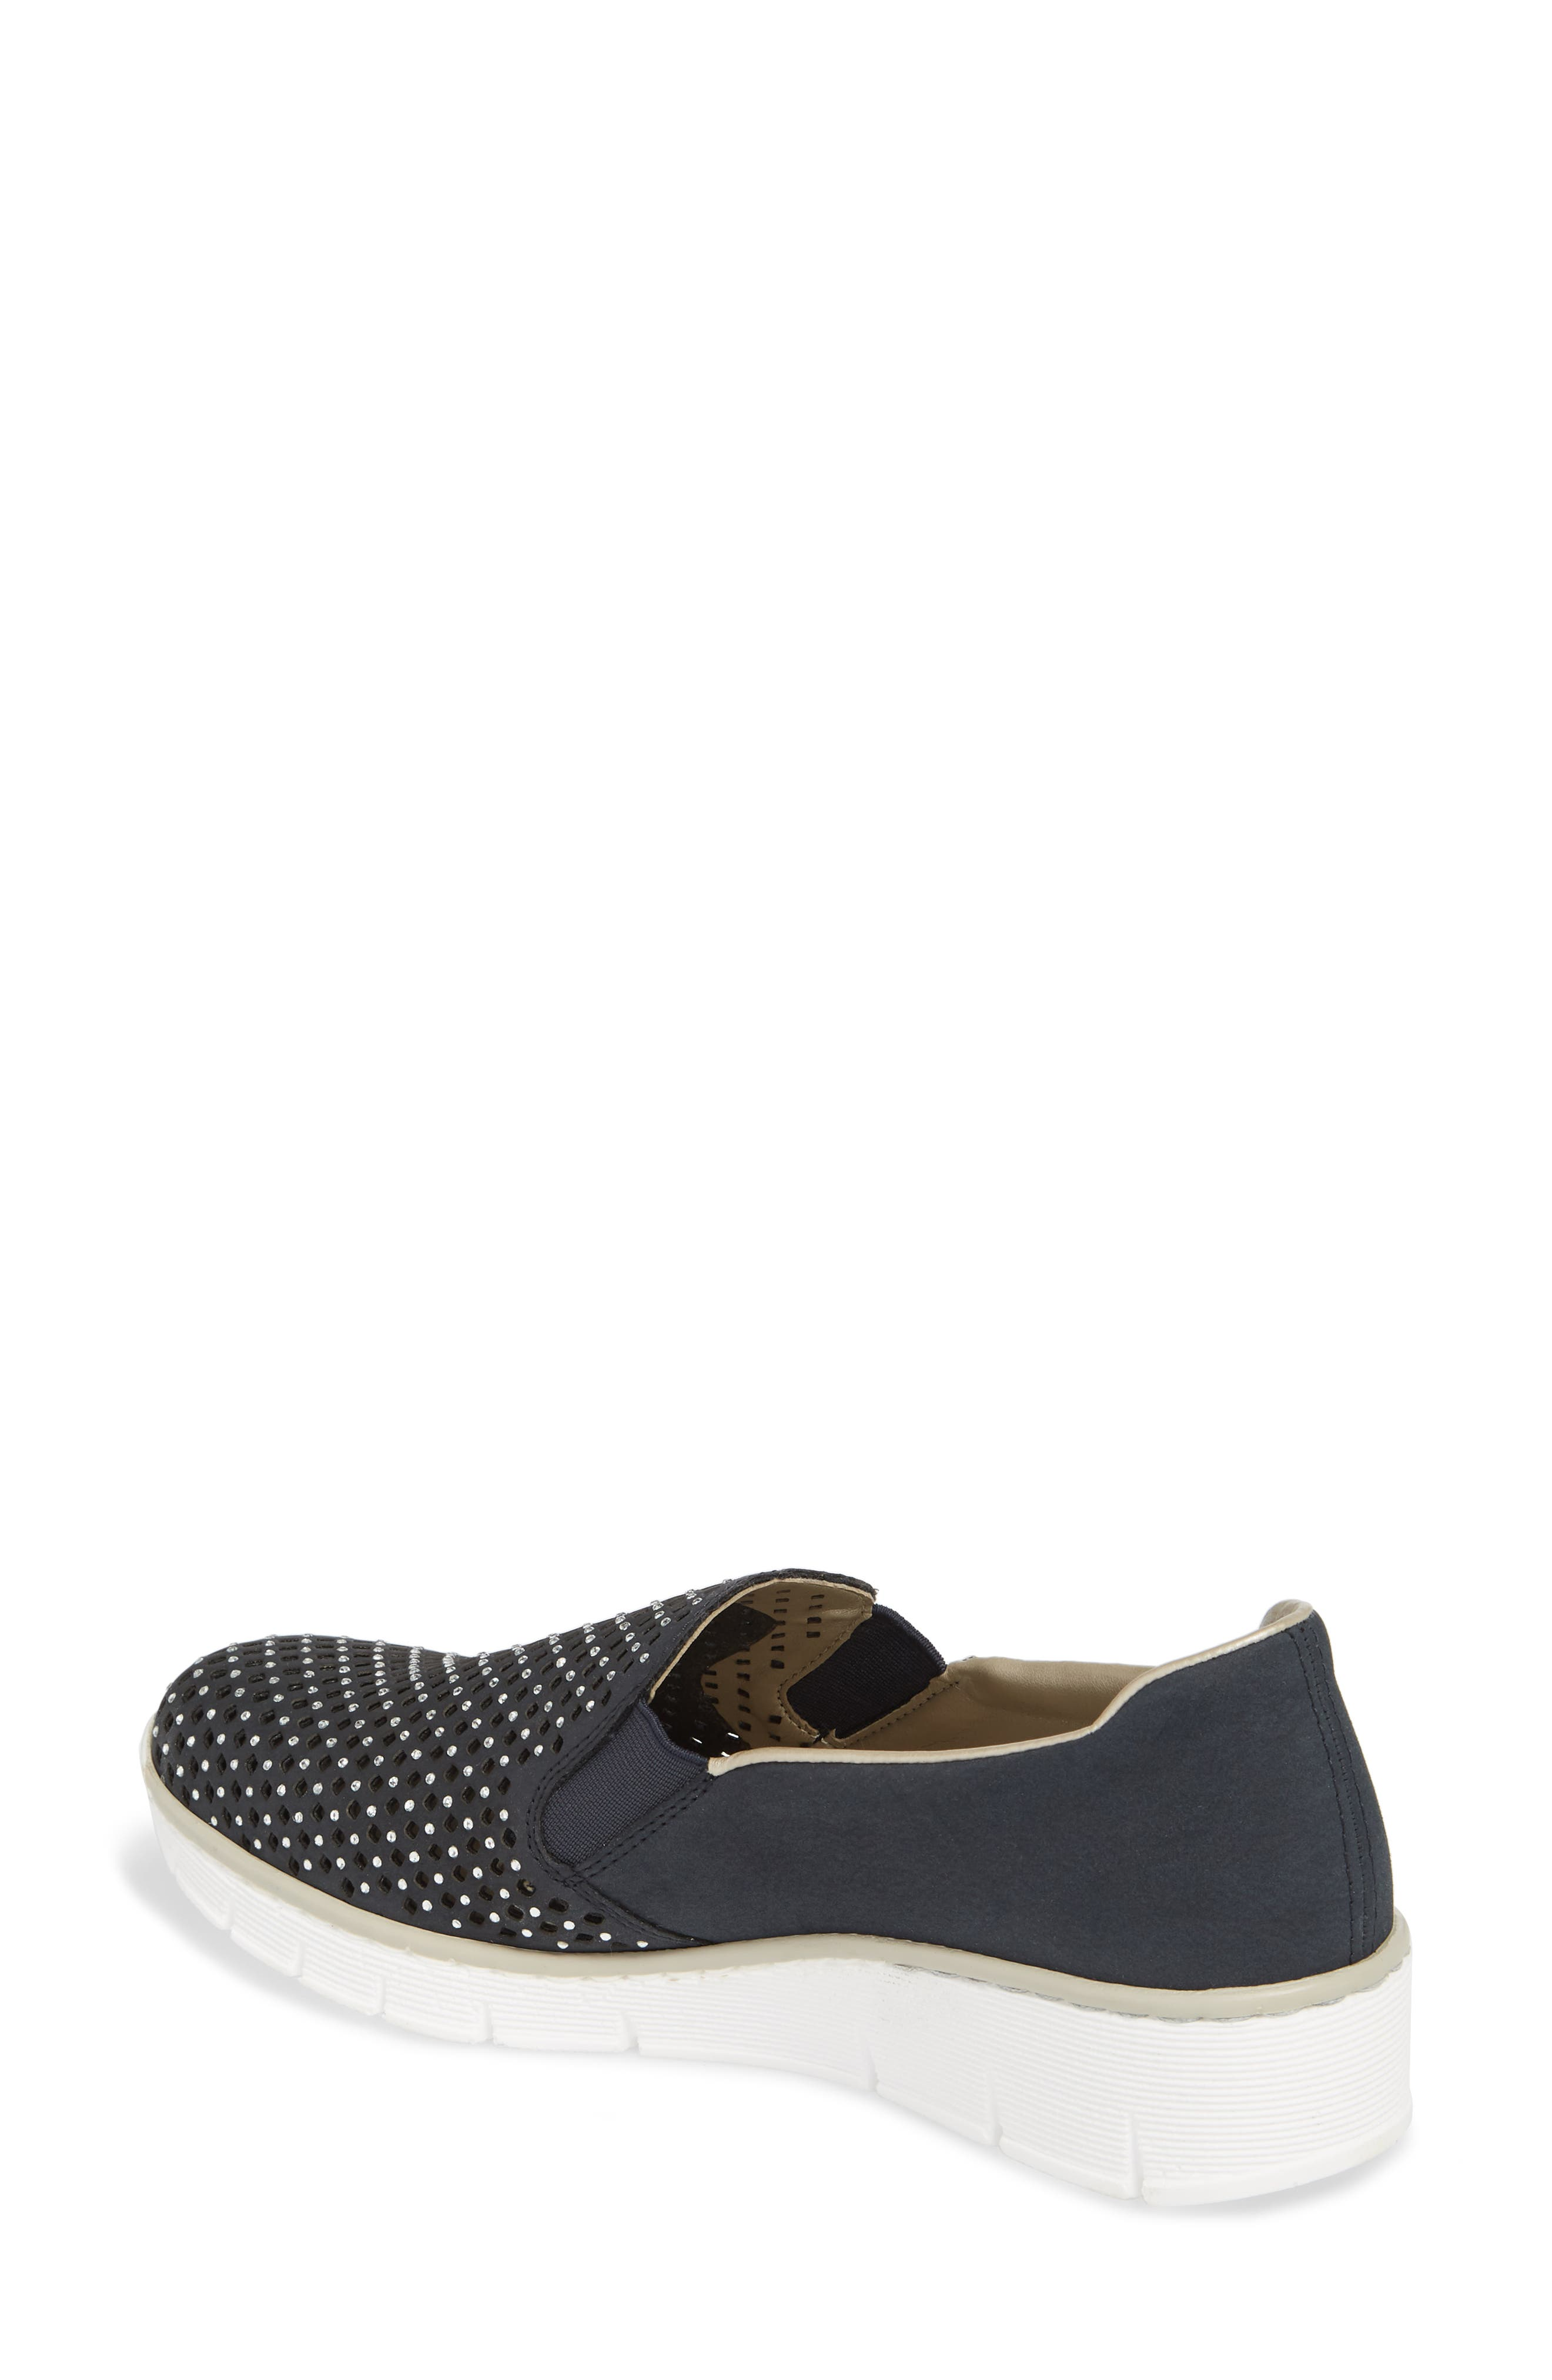 Doris A6 Wedge Sneaker,                             Alternate thumbnail 2, color,                             401